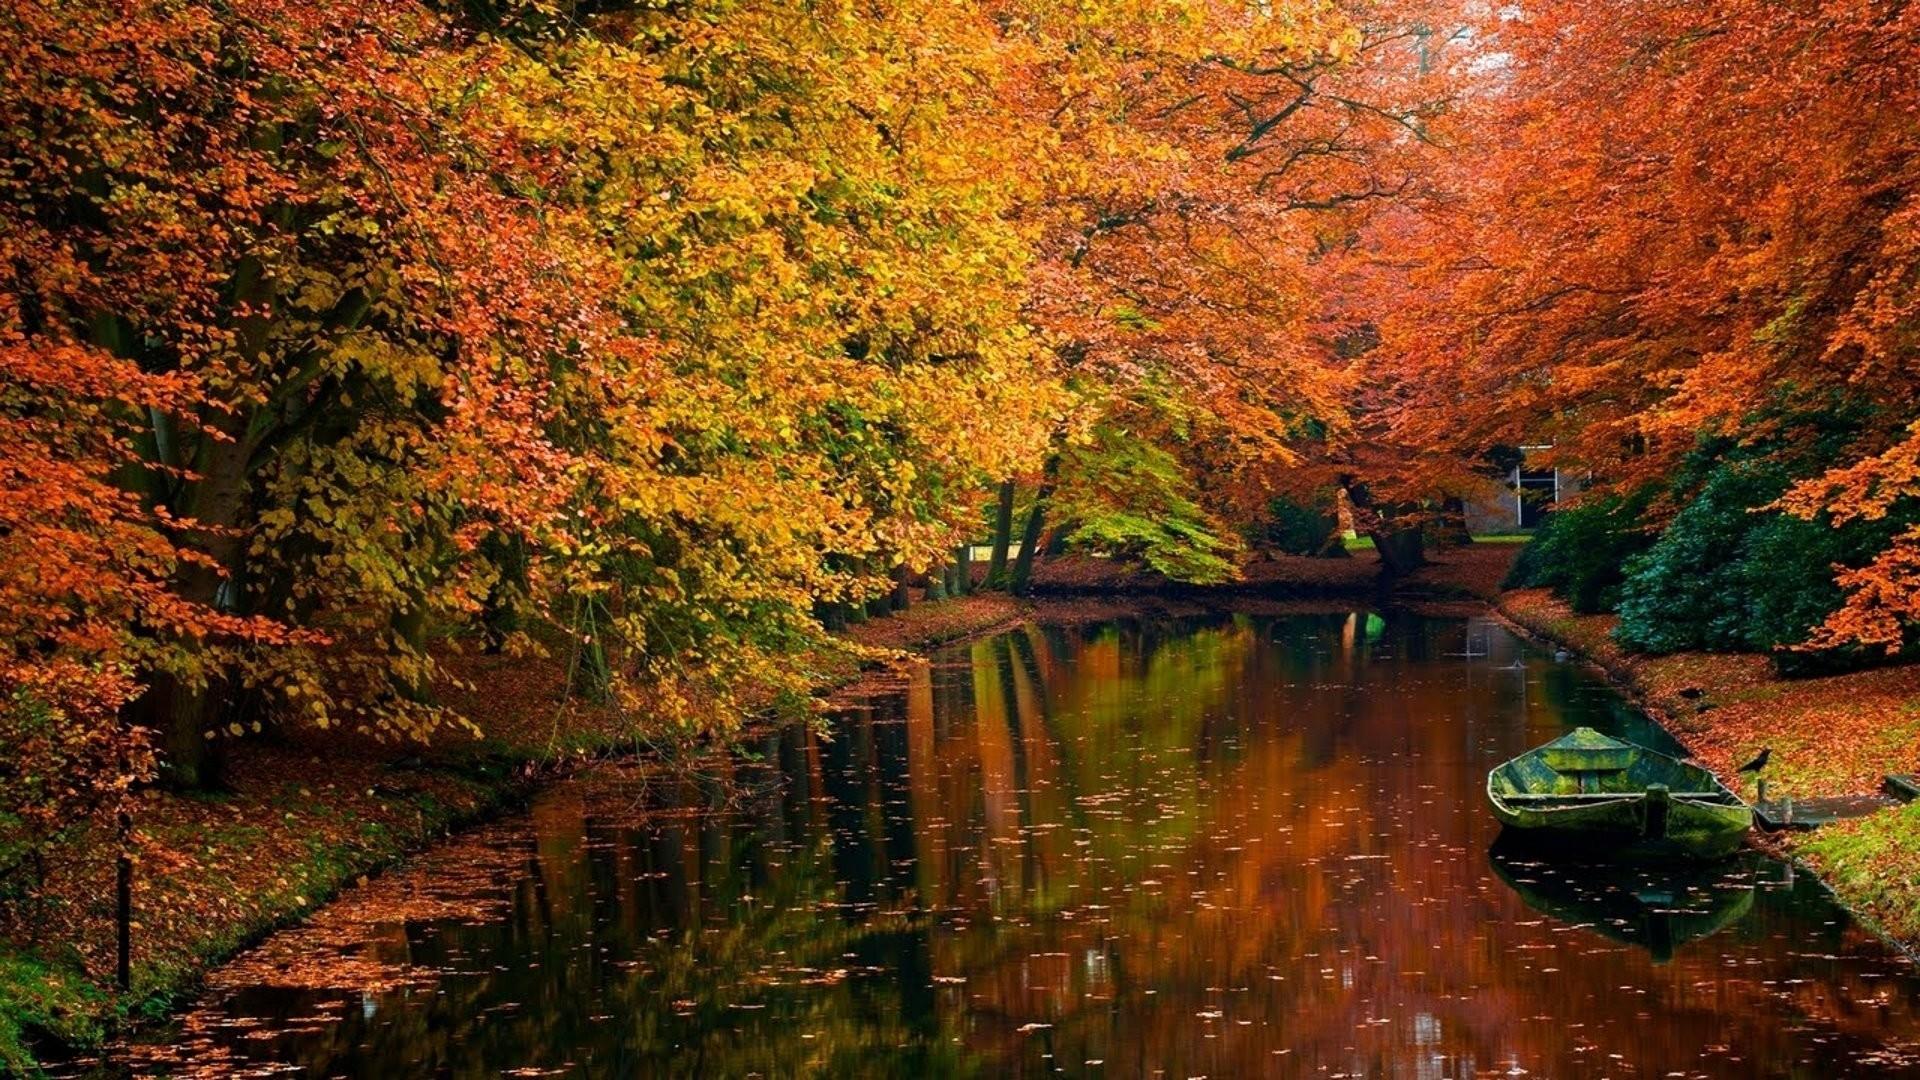 fall scenes screensavers | Tagged with: Fall Scene Fall Scene HD Wallpaper